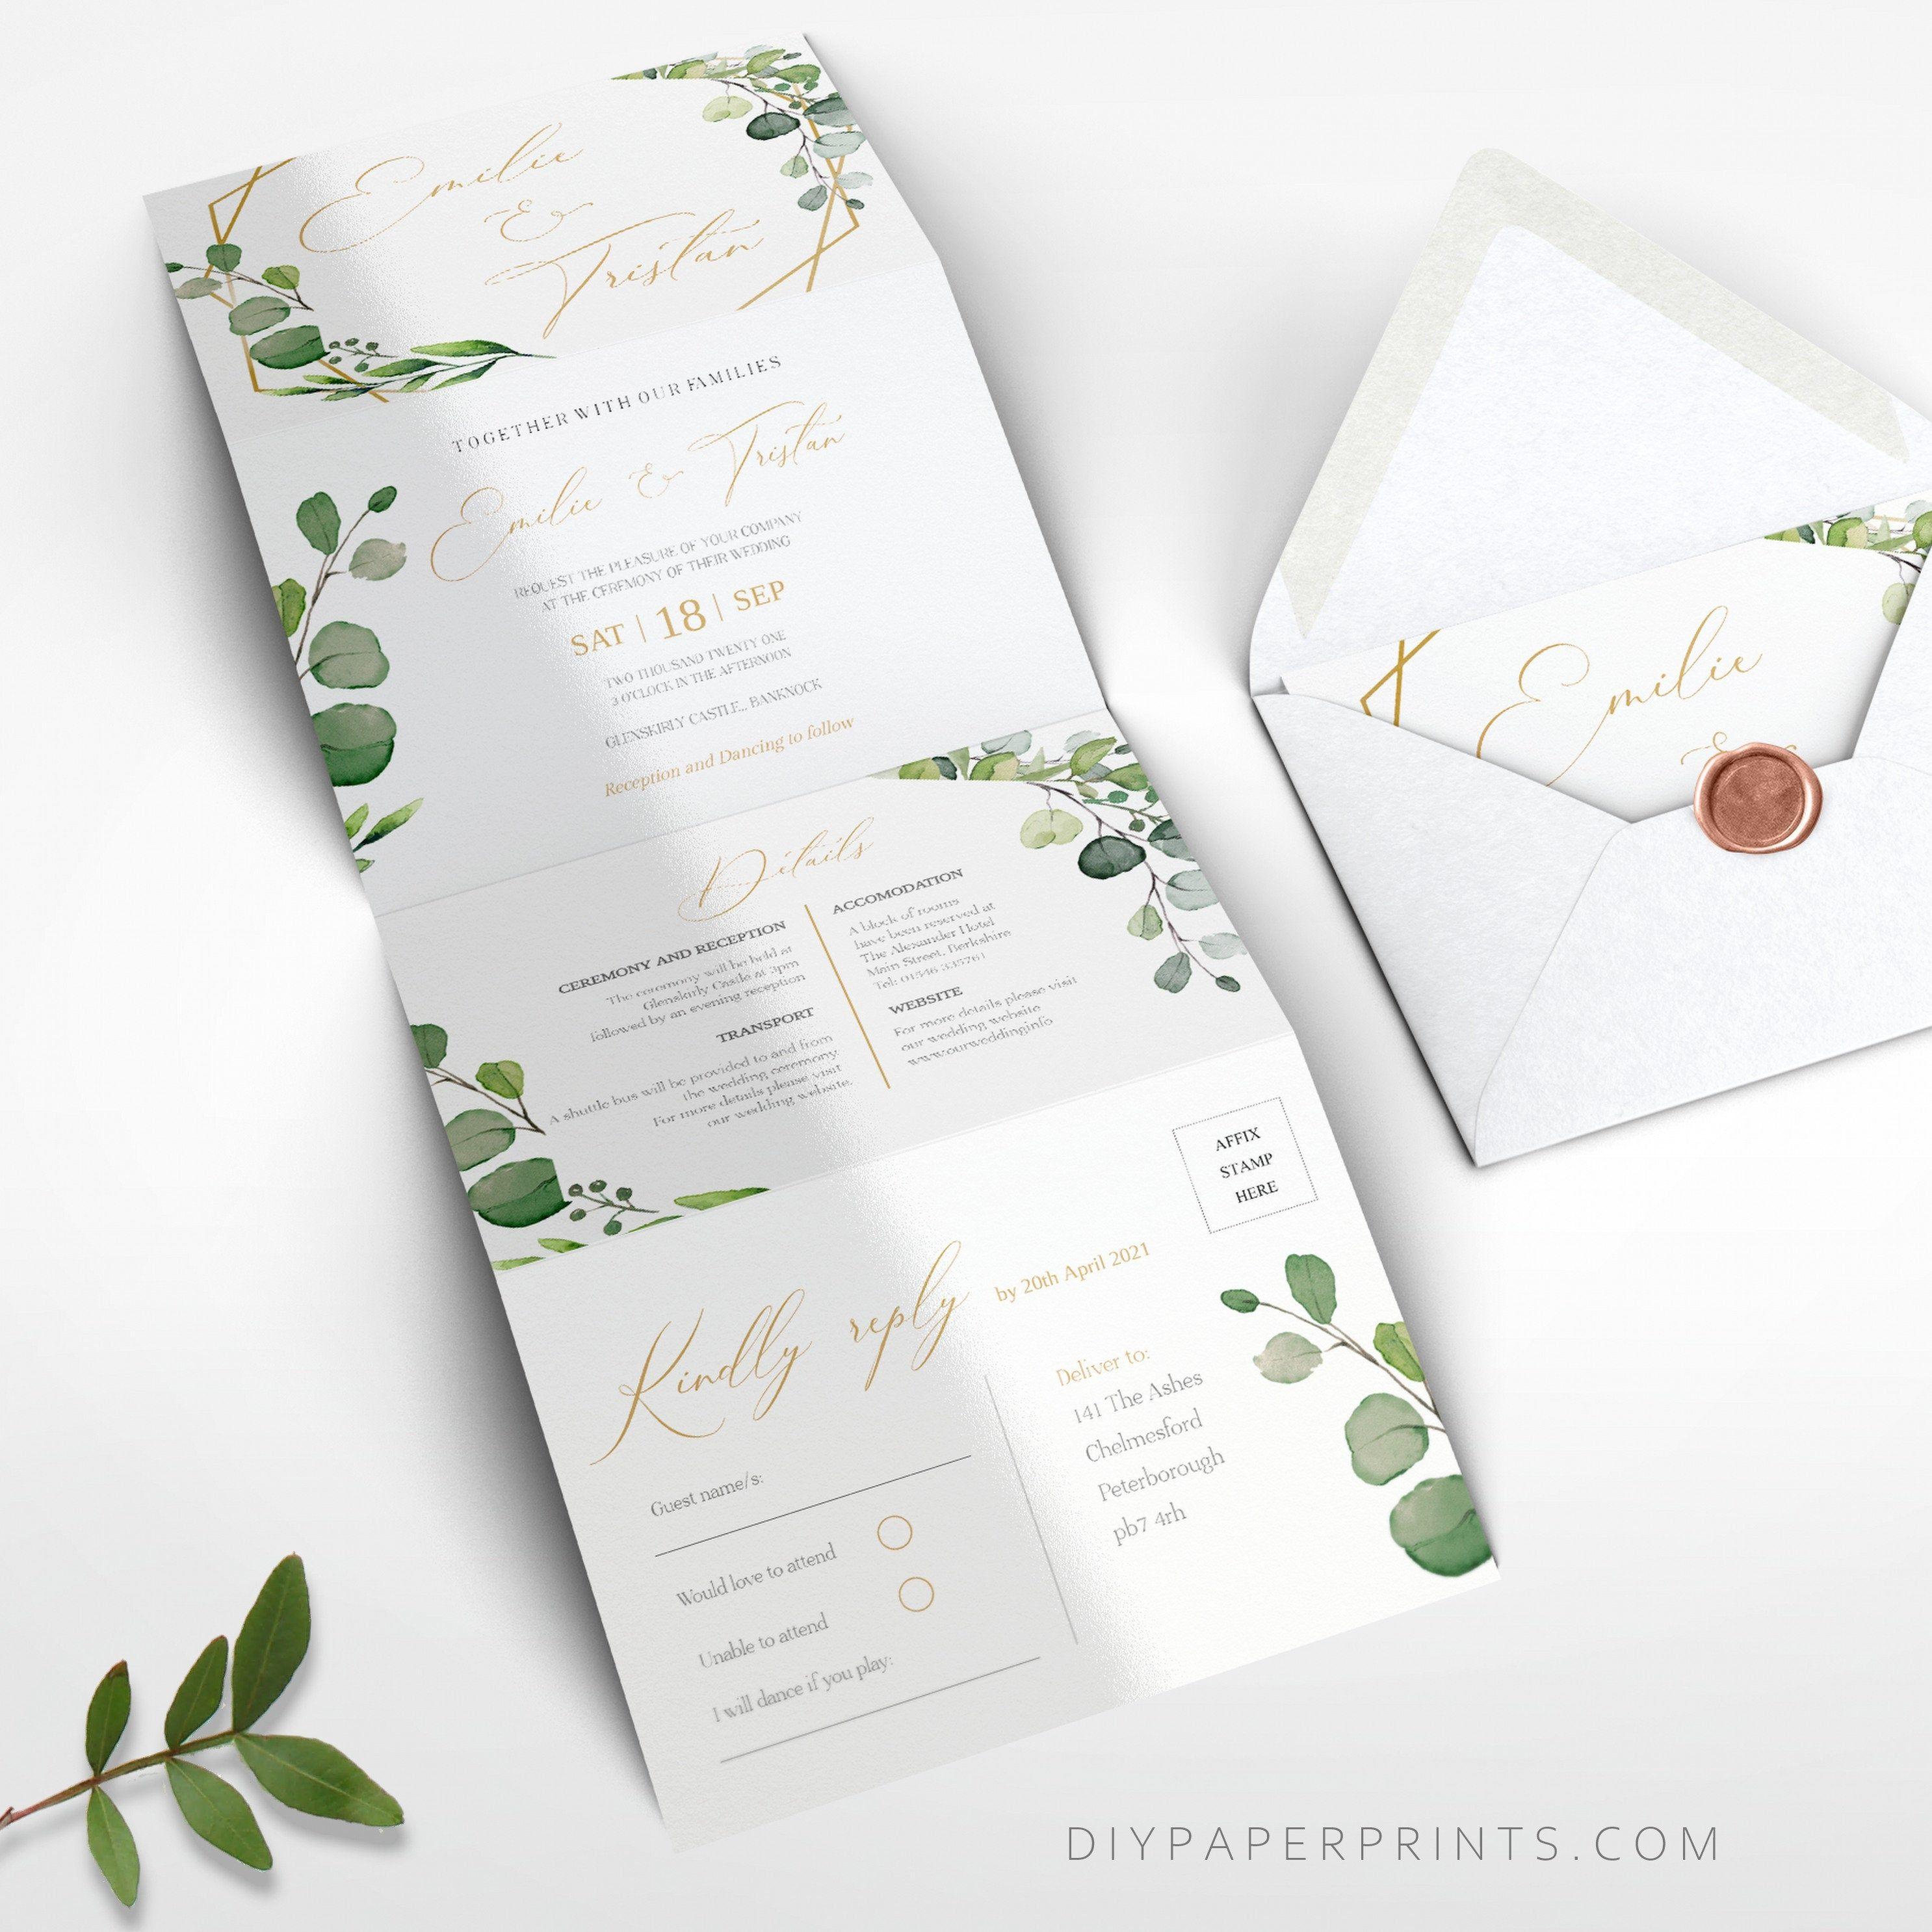 Greenery Wedding Invitation Template Concertina Invite Tri Fold Accordion Fol Wedding Invitation Templates Wedding Invitations Greenery Wedding Invitations